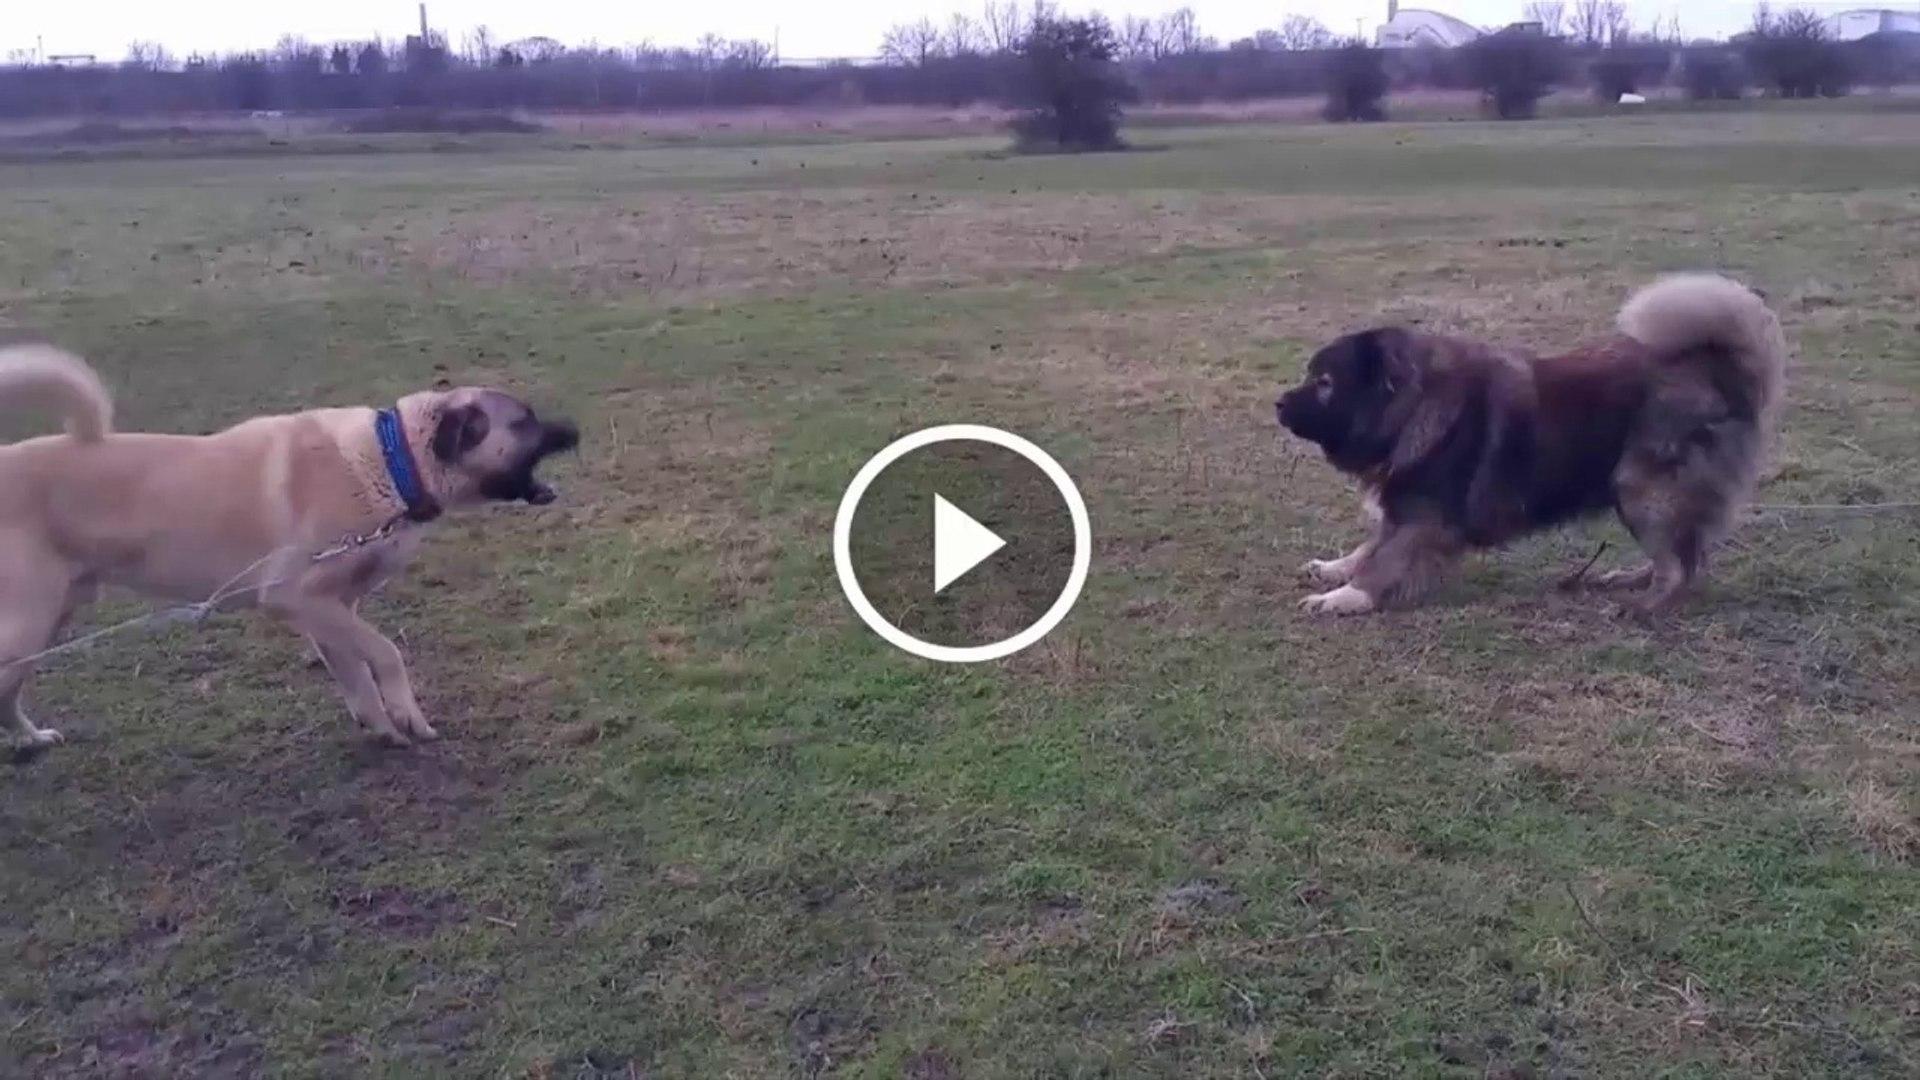 ANADOLU COBAN KOPEGi ve KAFKAS COBAN KOPEGi ATISMA - ANATOLiAN SHEPHERD DOG vs CAUCASiAN SHEPHERD DO